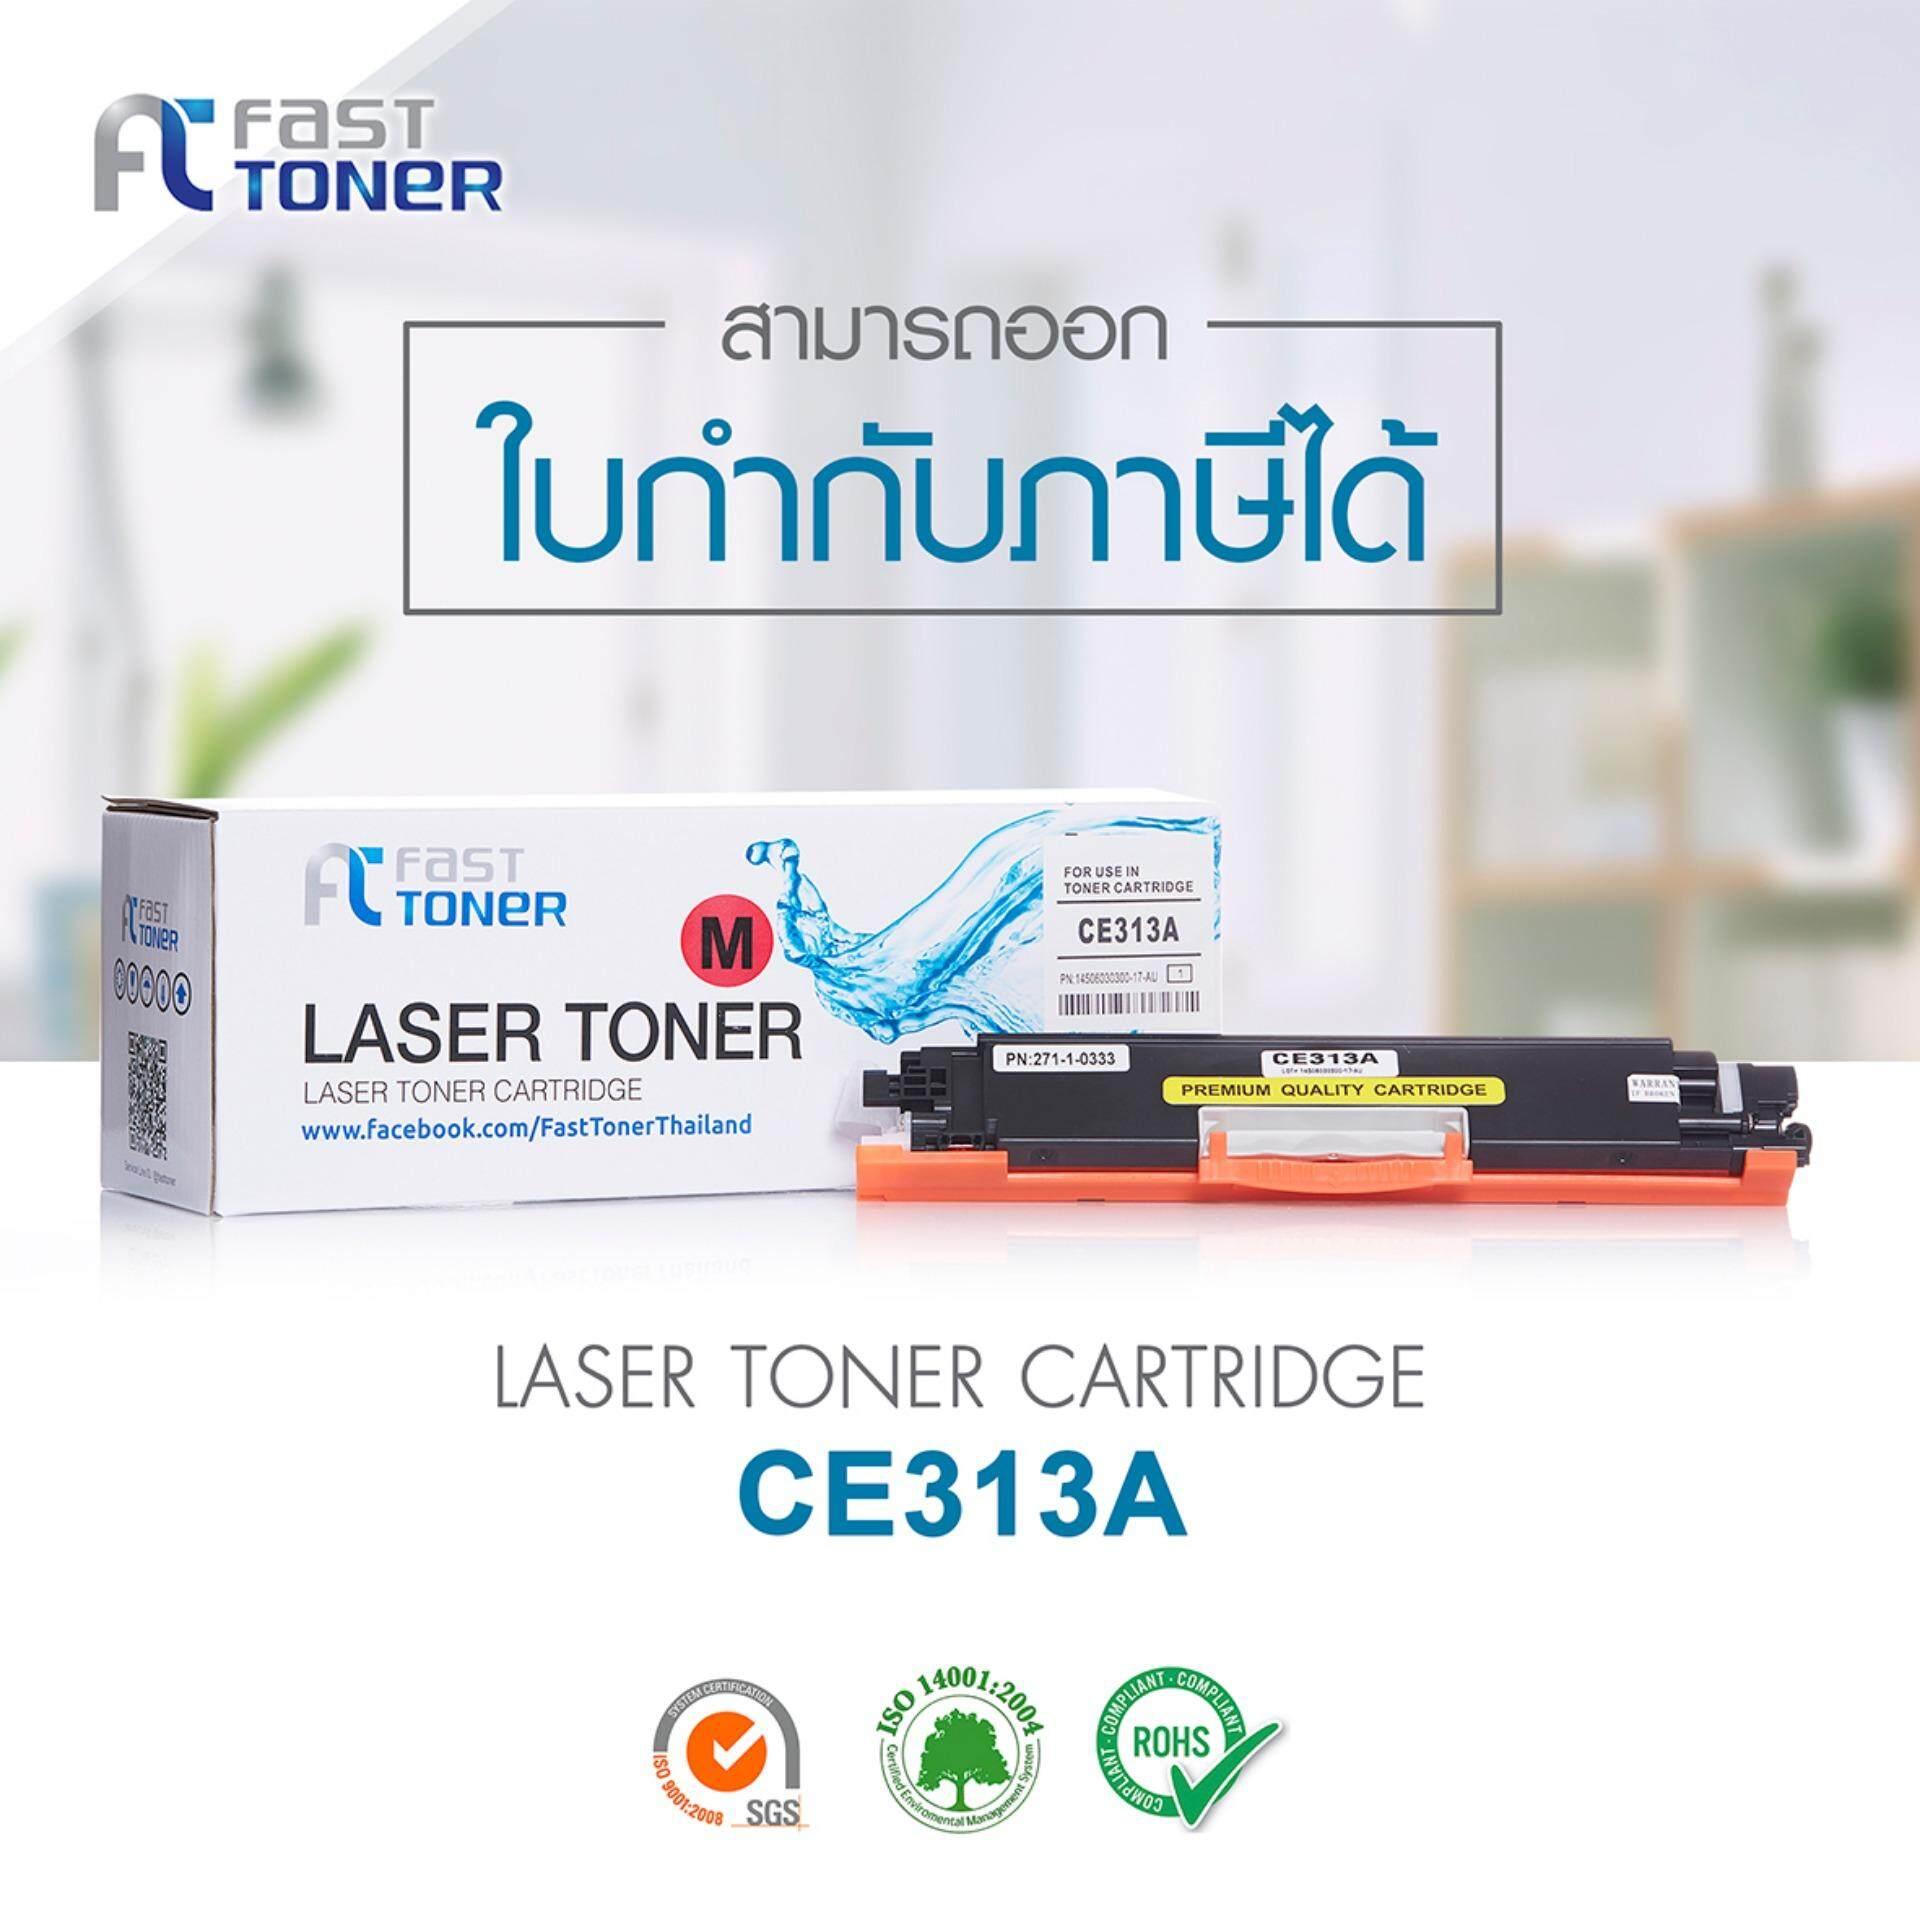 Fast Toner HP ตลับหมึกเลเซอร์เทียบเท่า 126A รุ่น CE313A (MAGENTA) สำหรับเครื่องพิมพ์ HP LaserJet Printer CP1025/Cp1025NW/M175nwCanon LBP 7010C/7018C